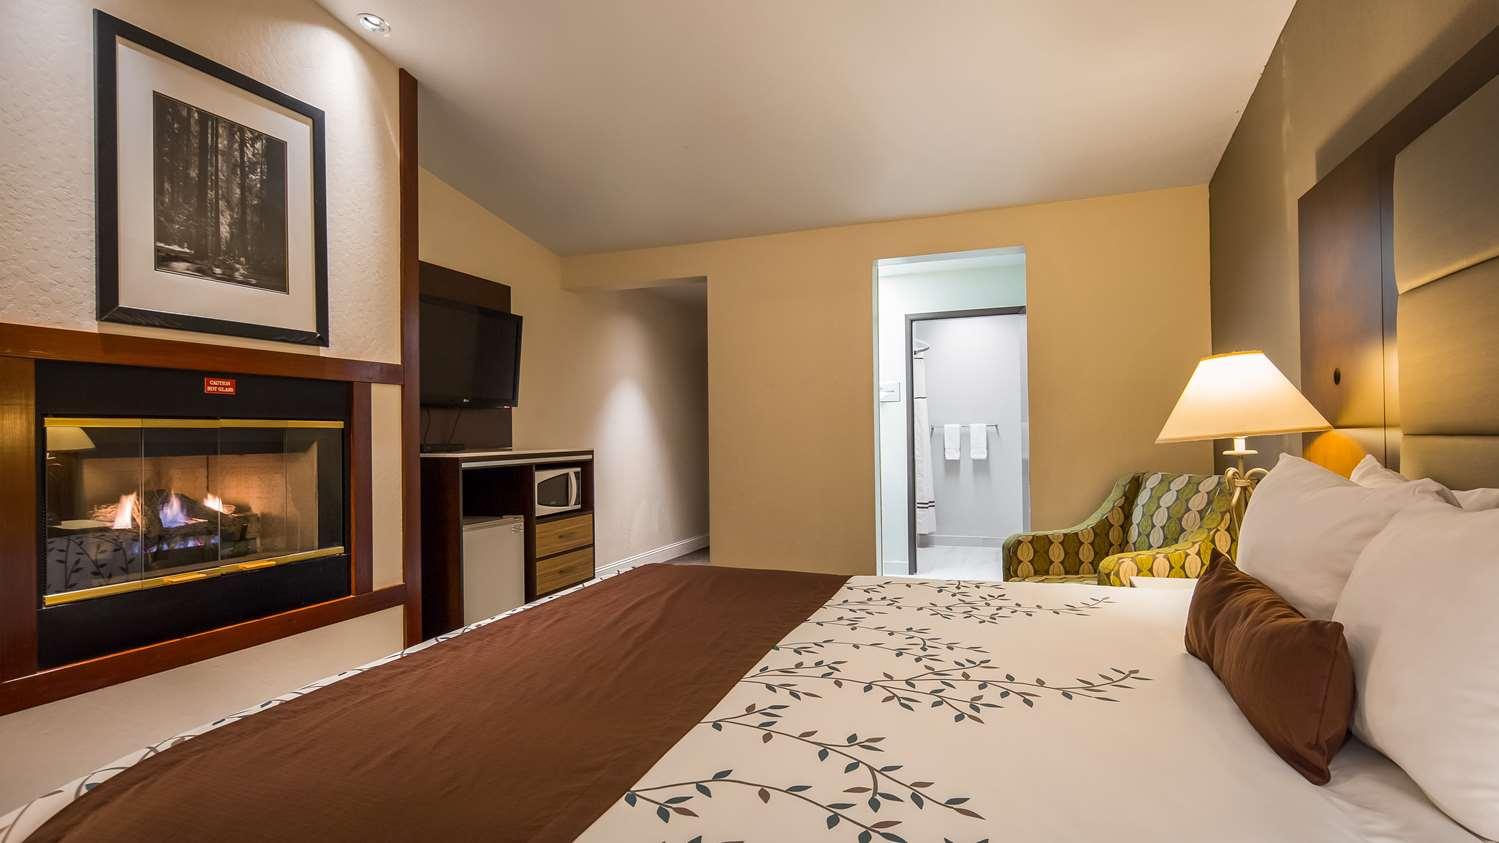 Hotel In Gilroy, CA - Best Western Plus Forest Park Inn